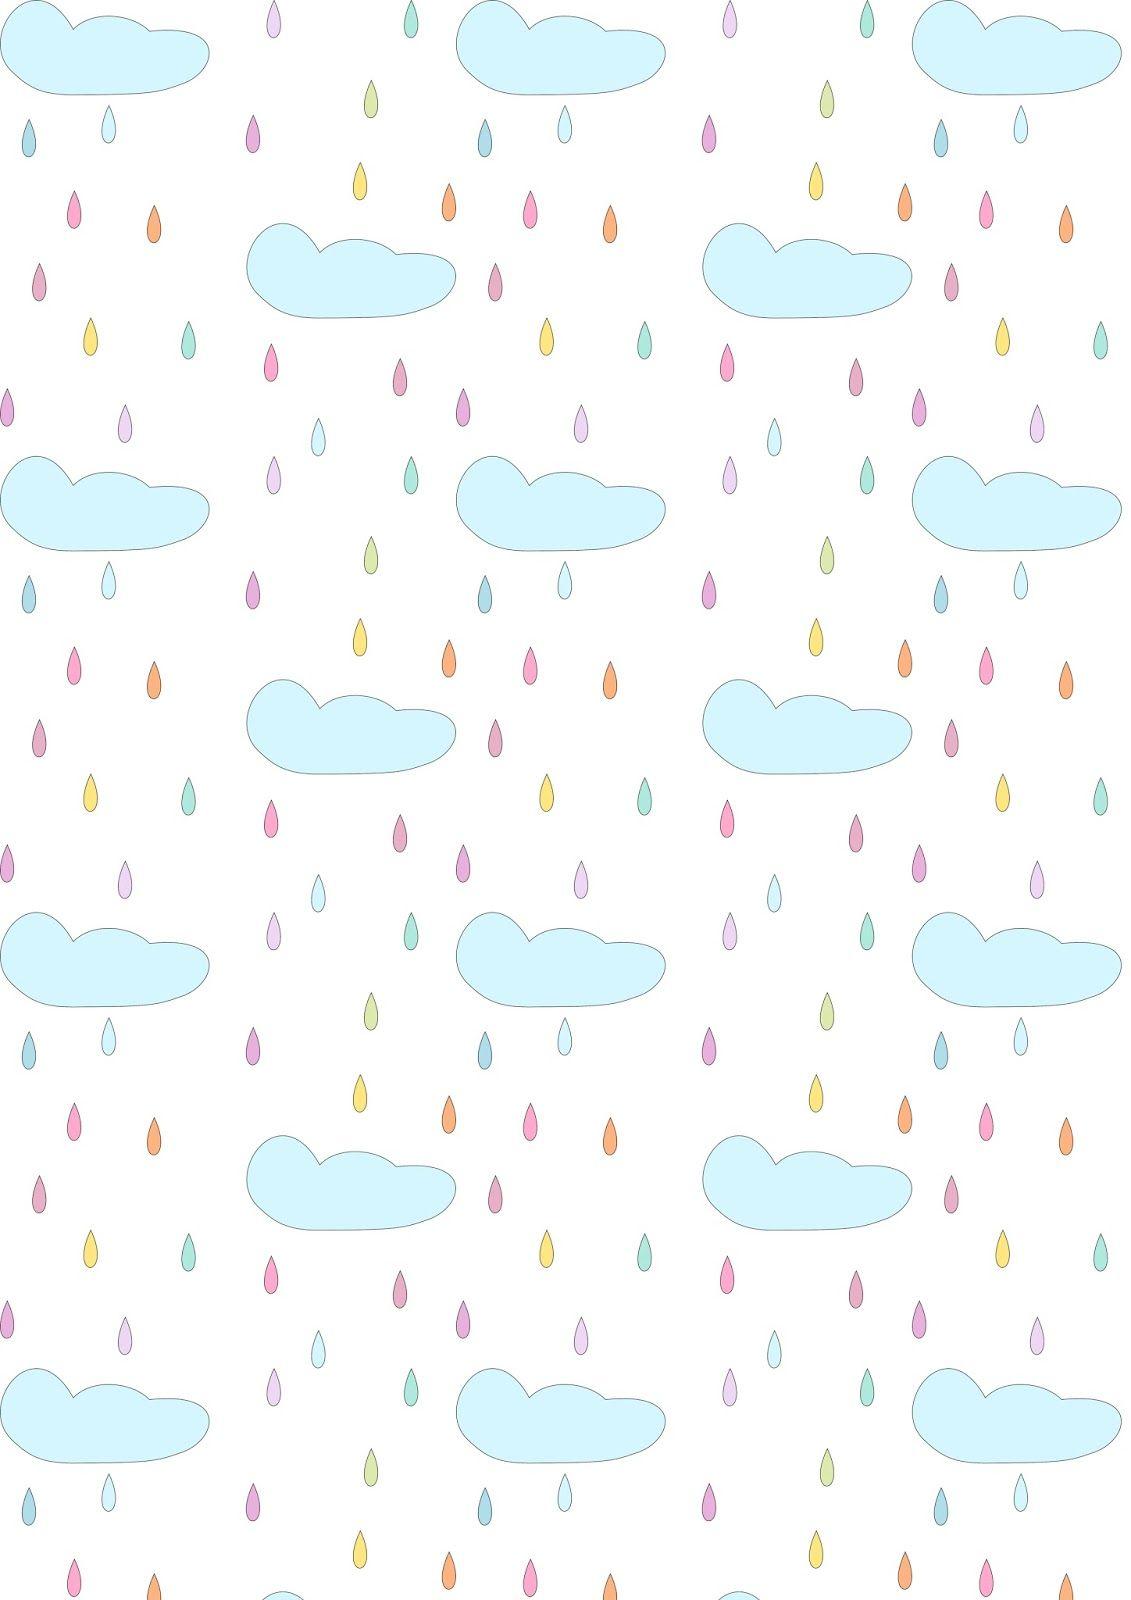 Scrapbook paper dollhouse wallpaper - Free Printable Rainy Clouds Pattern Paper Nurserypattern Pastel Dollhouse Wallpaper